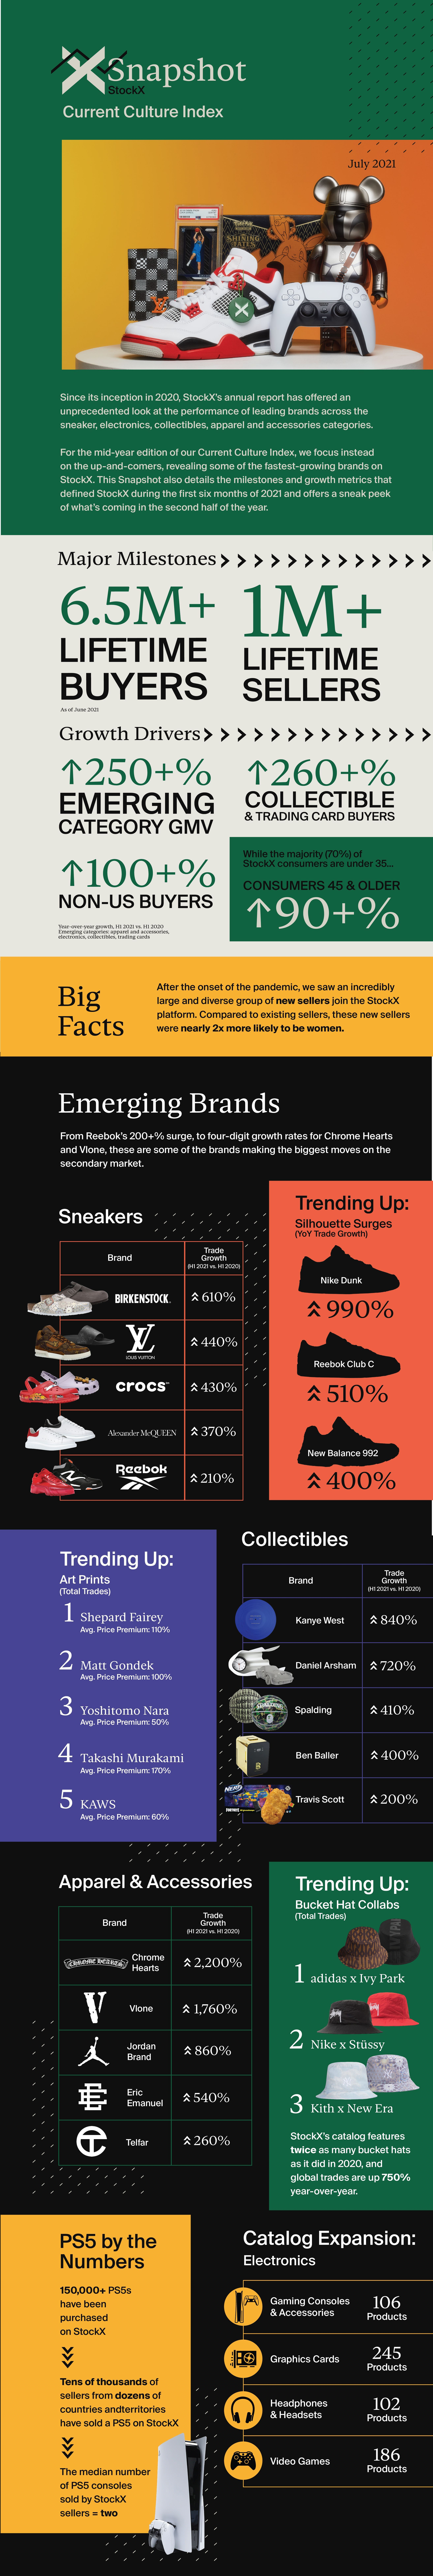 Resell obchod nespí ani počas koronakrízy. Hodnota produktov Chrome Hearts, Nike či Louis Vuitton vzrástla o stovky percent